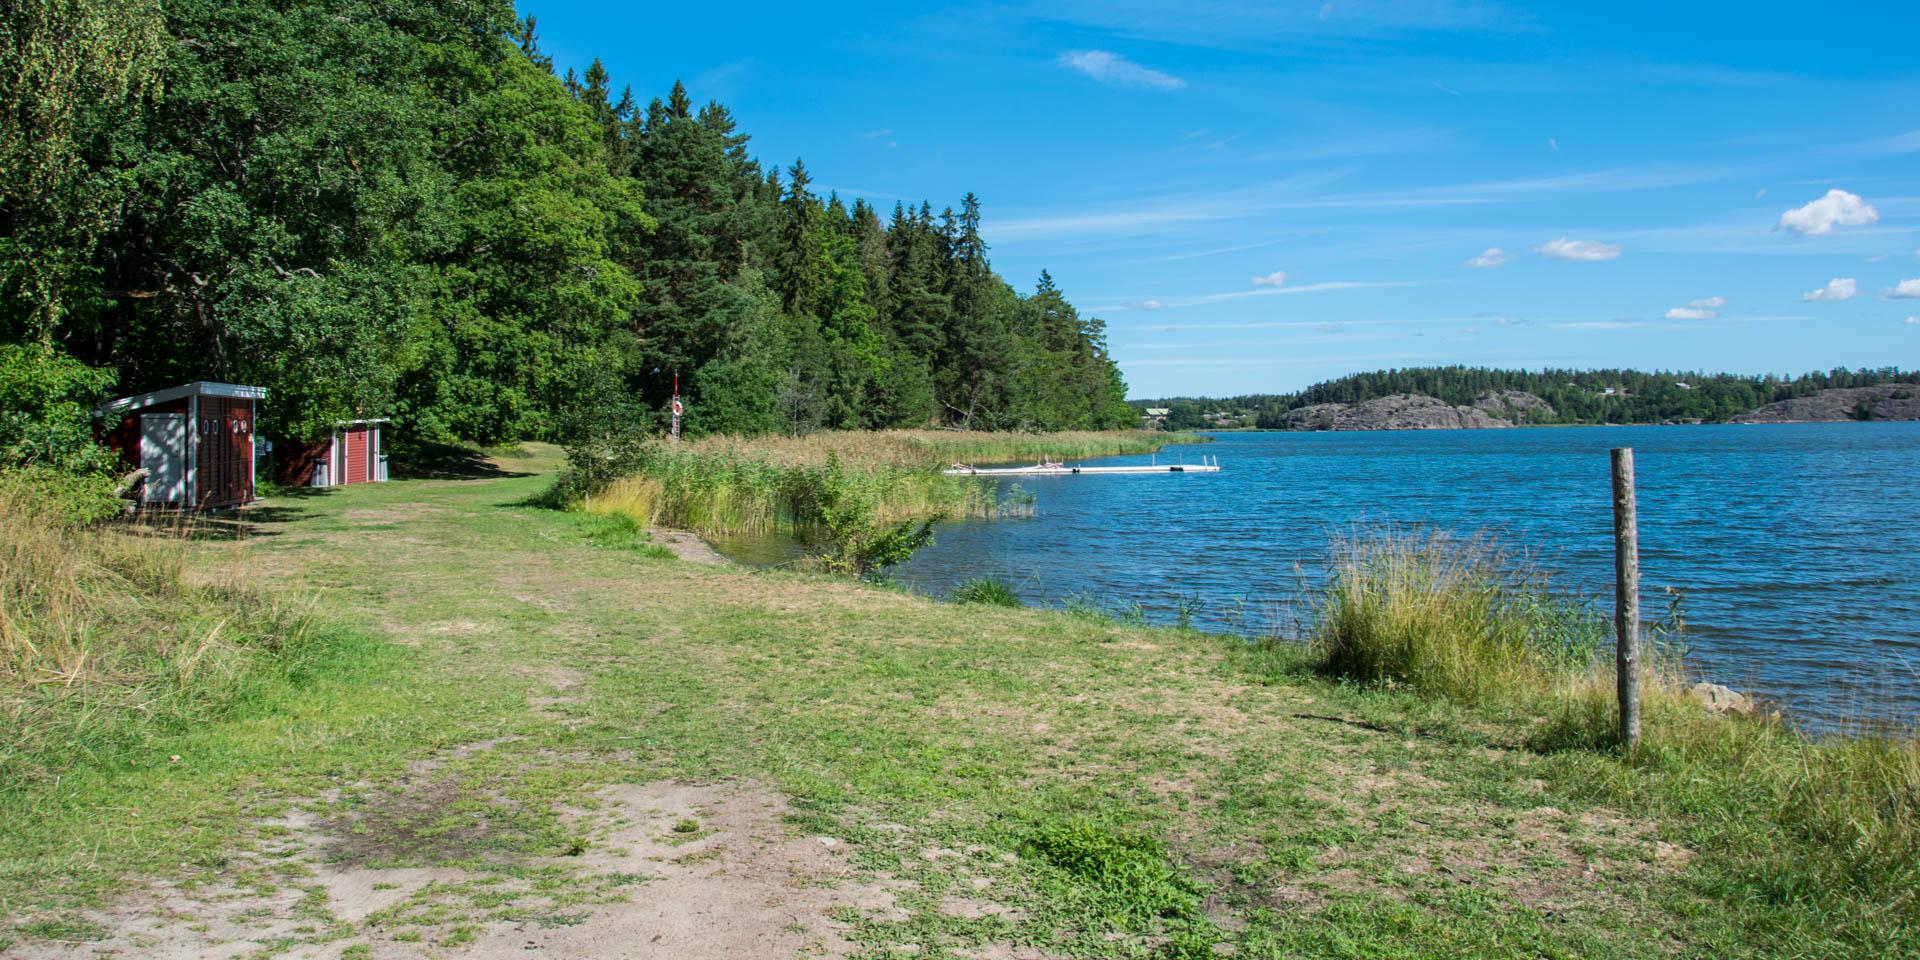 Husbyviks Badplats 2018